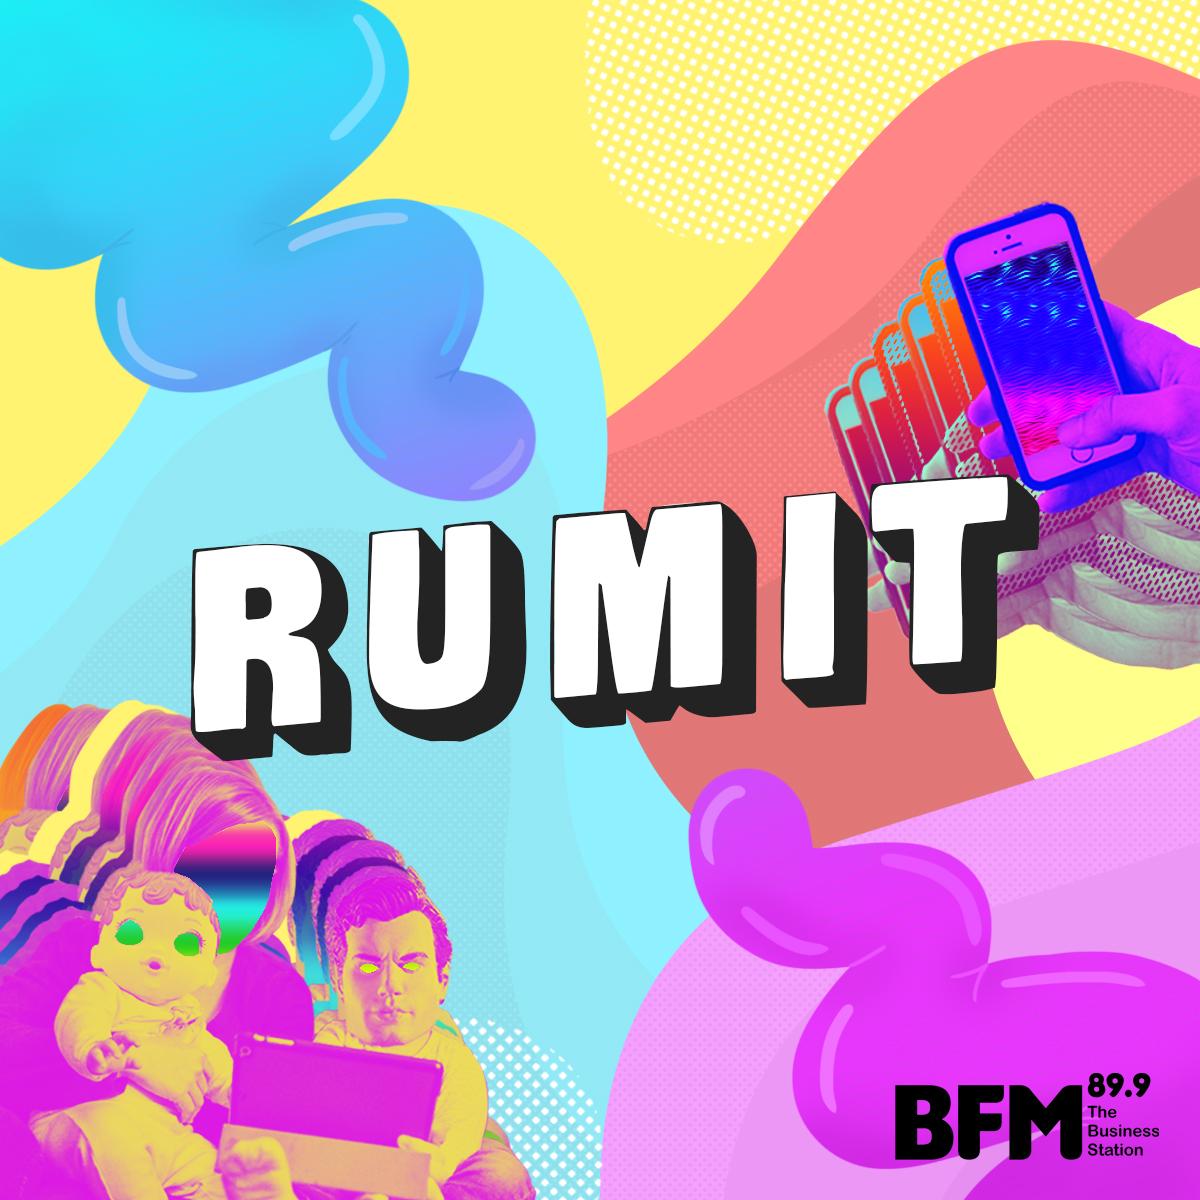 RUMIT_thumbnail_ with logo.jpg